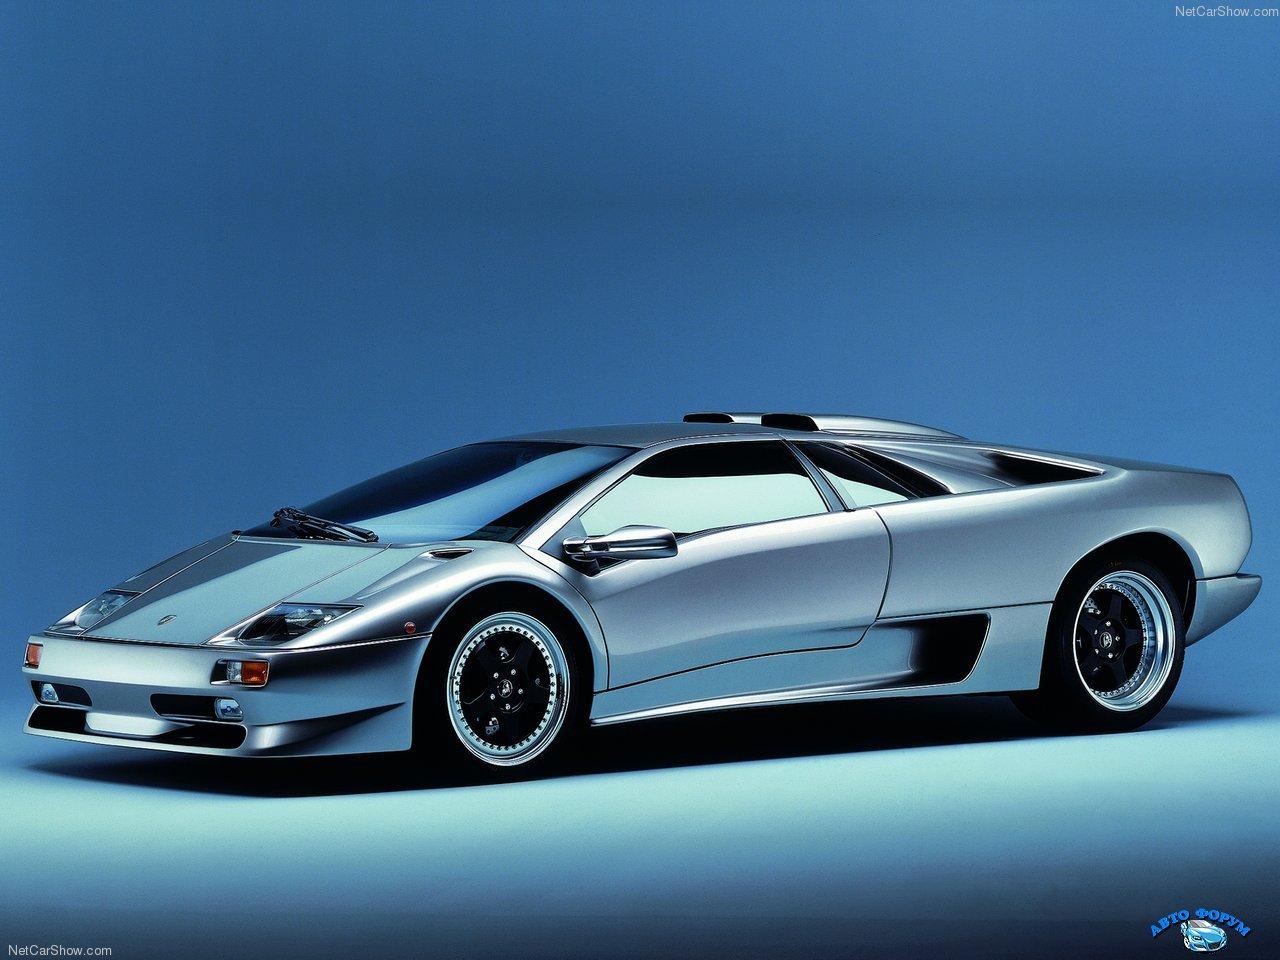 Lamborghini-Diablo_SV_1996_1280x960_wallpaper_01.jpg